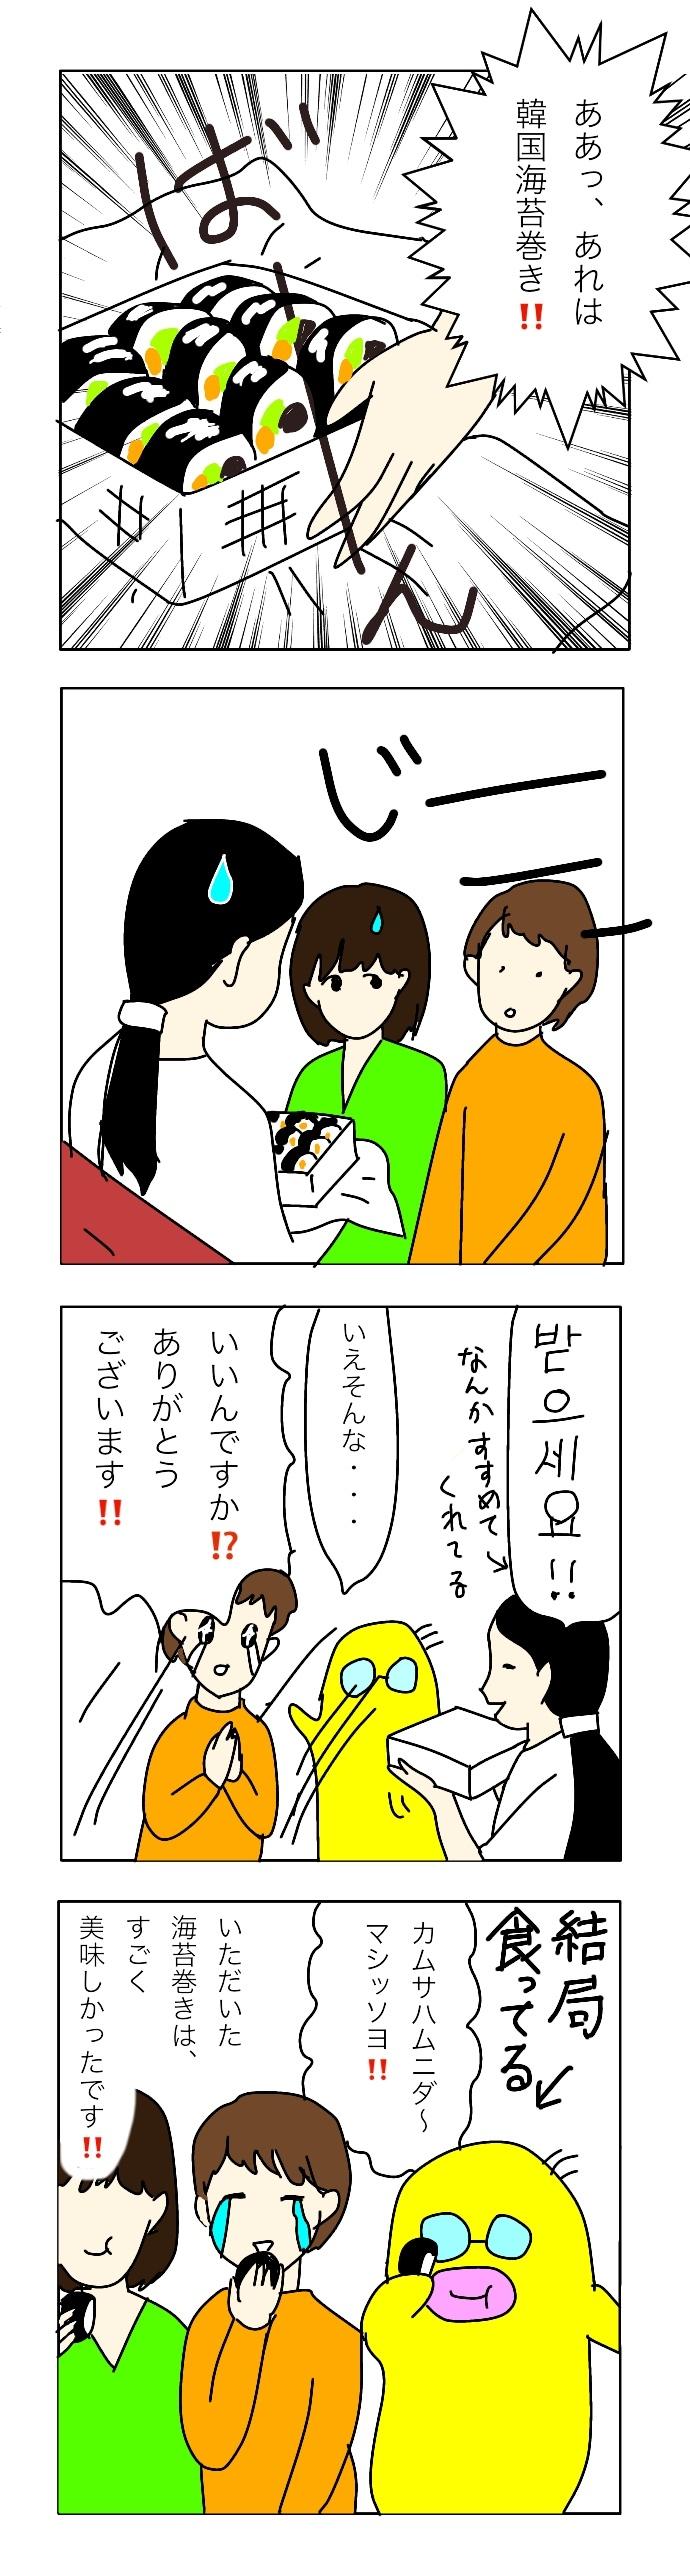 kankoku7 最後